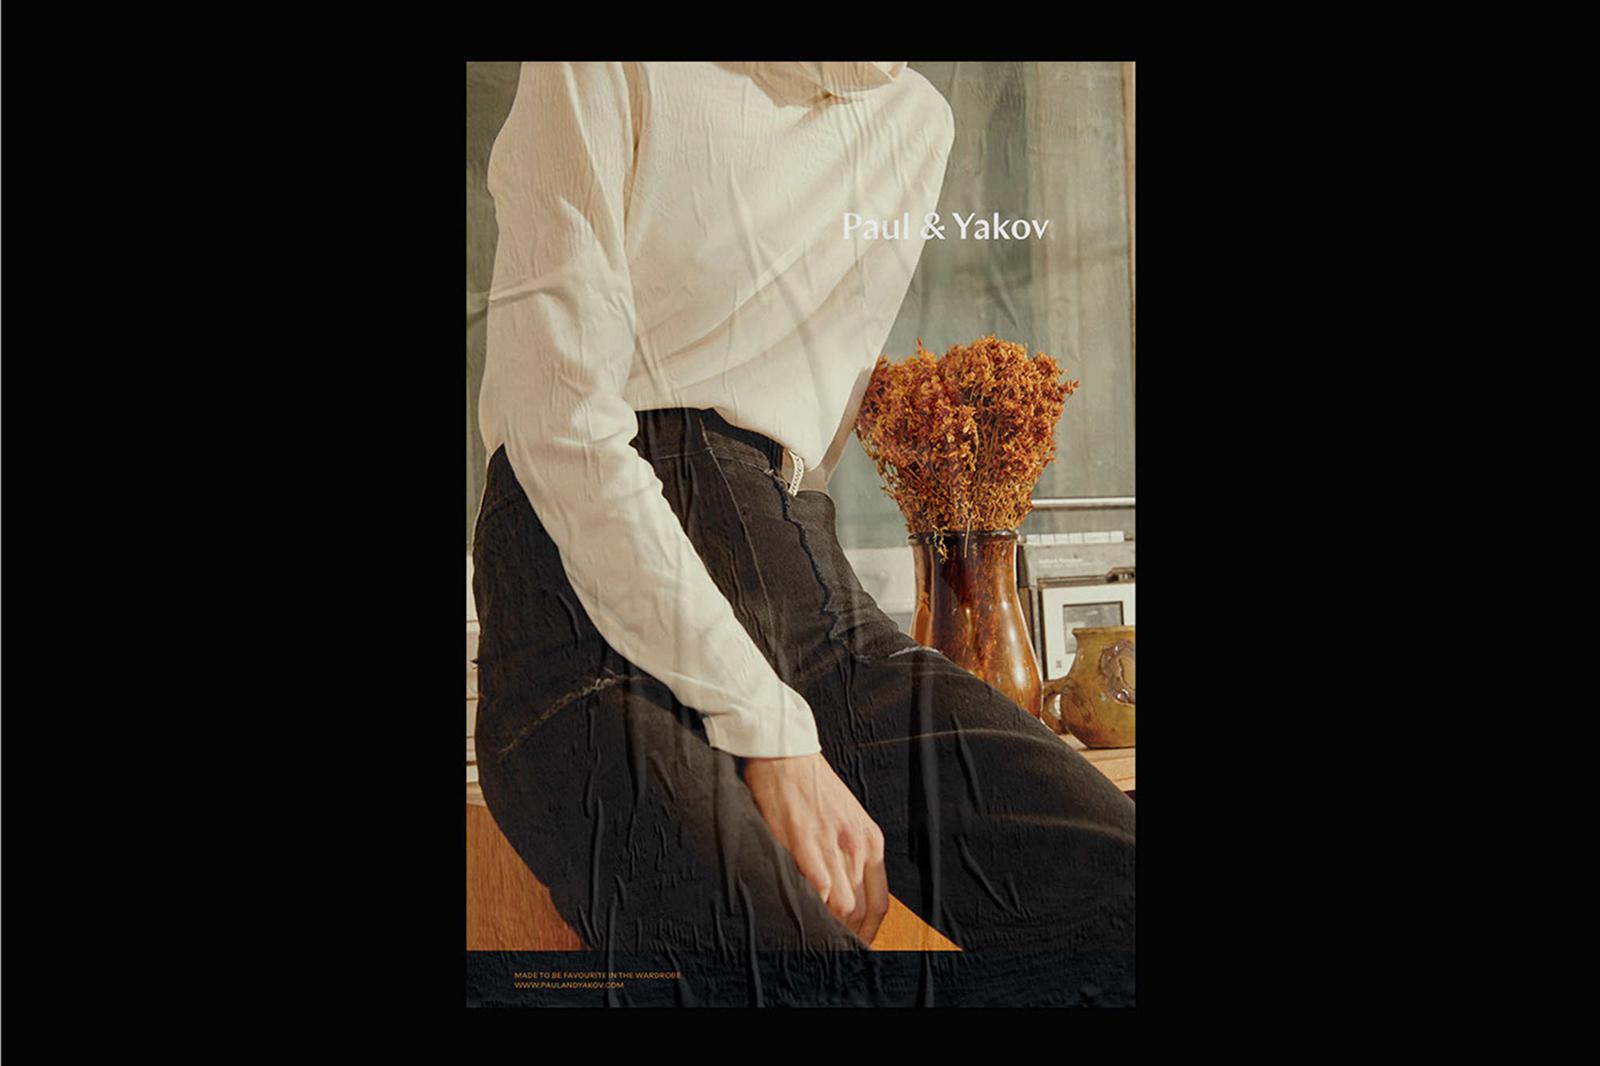 Paul & Yakov 时装品牌视觉VI形象设计欣赏-深圳VI设计5